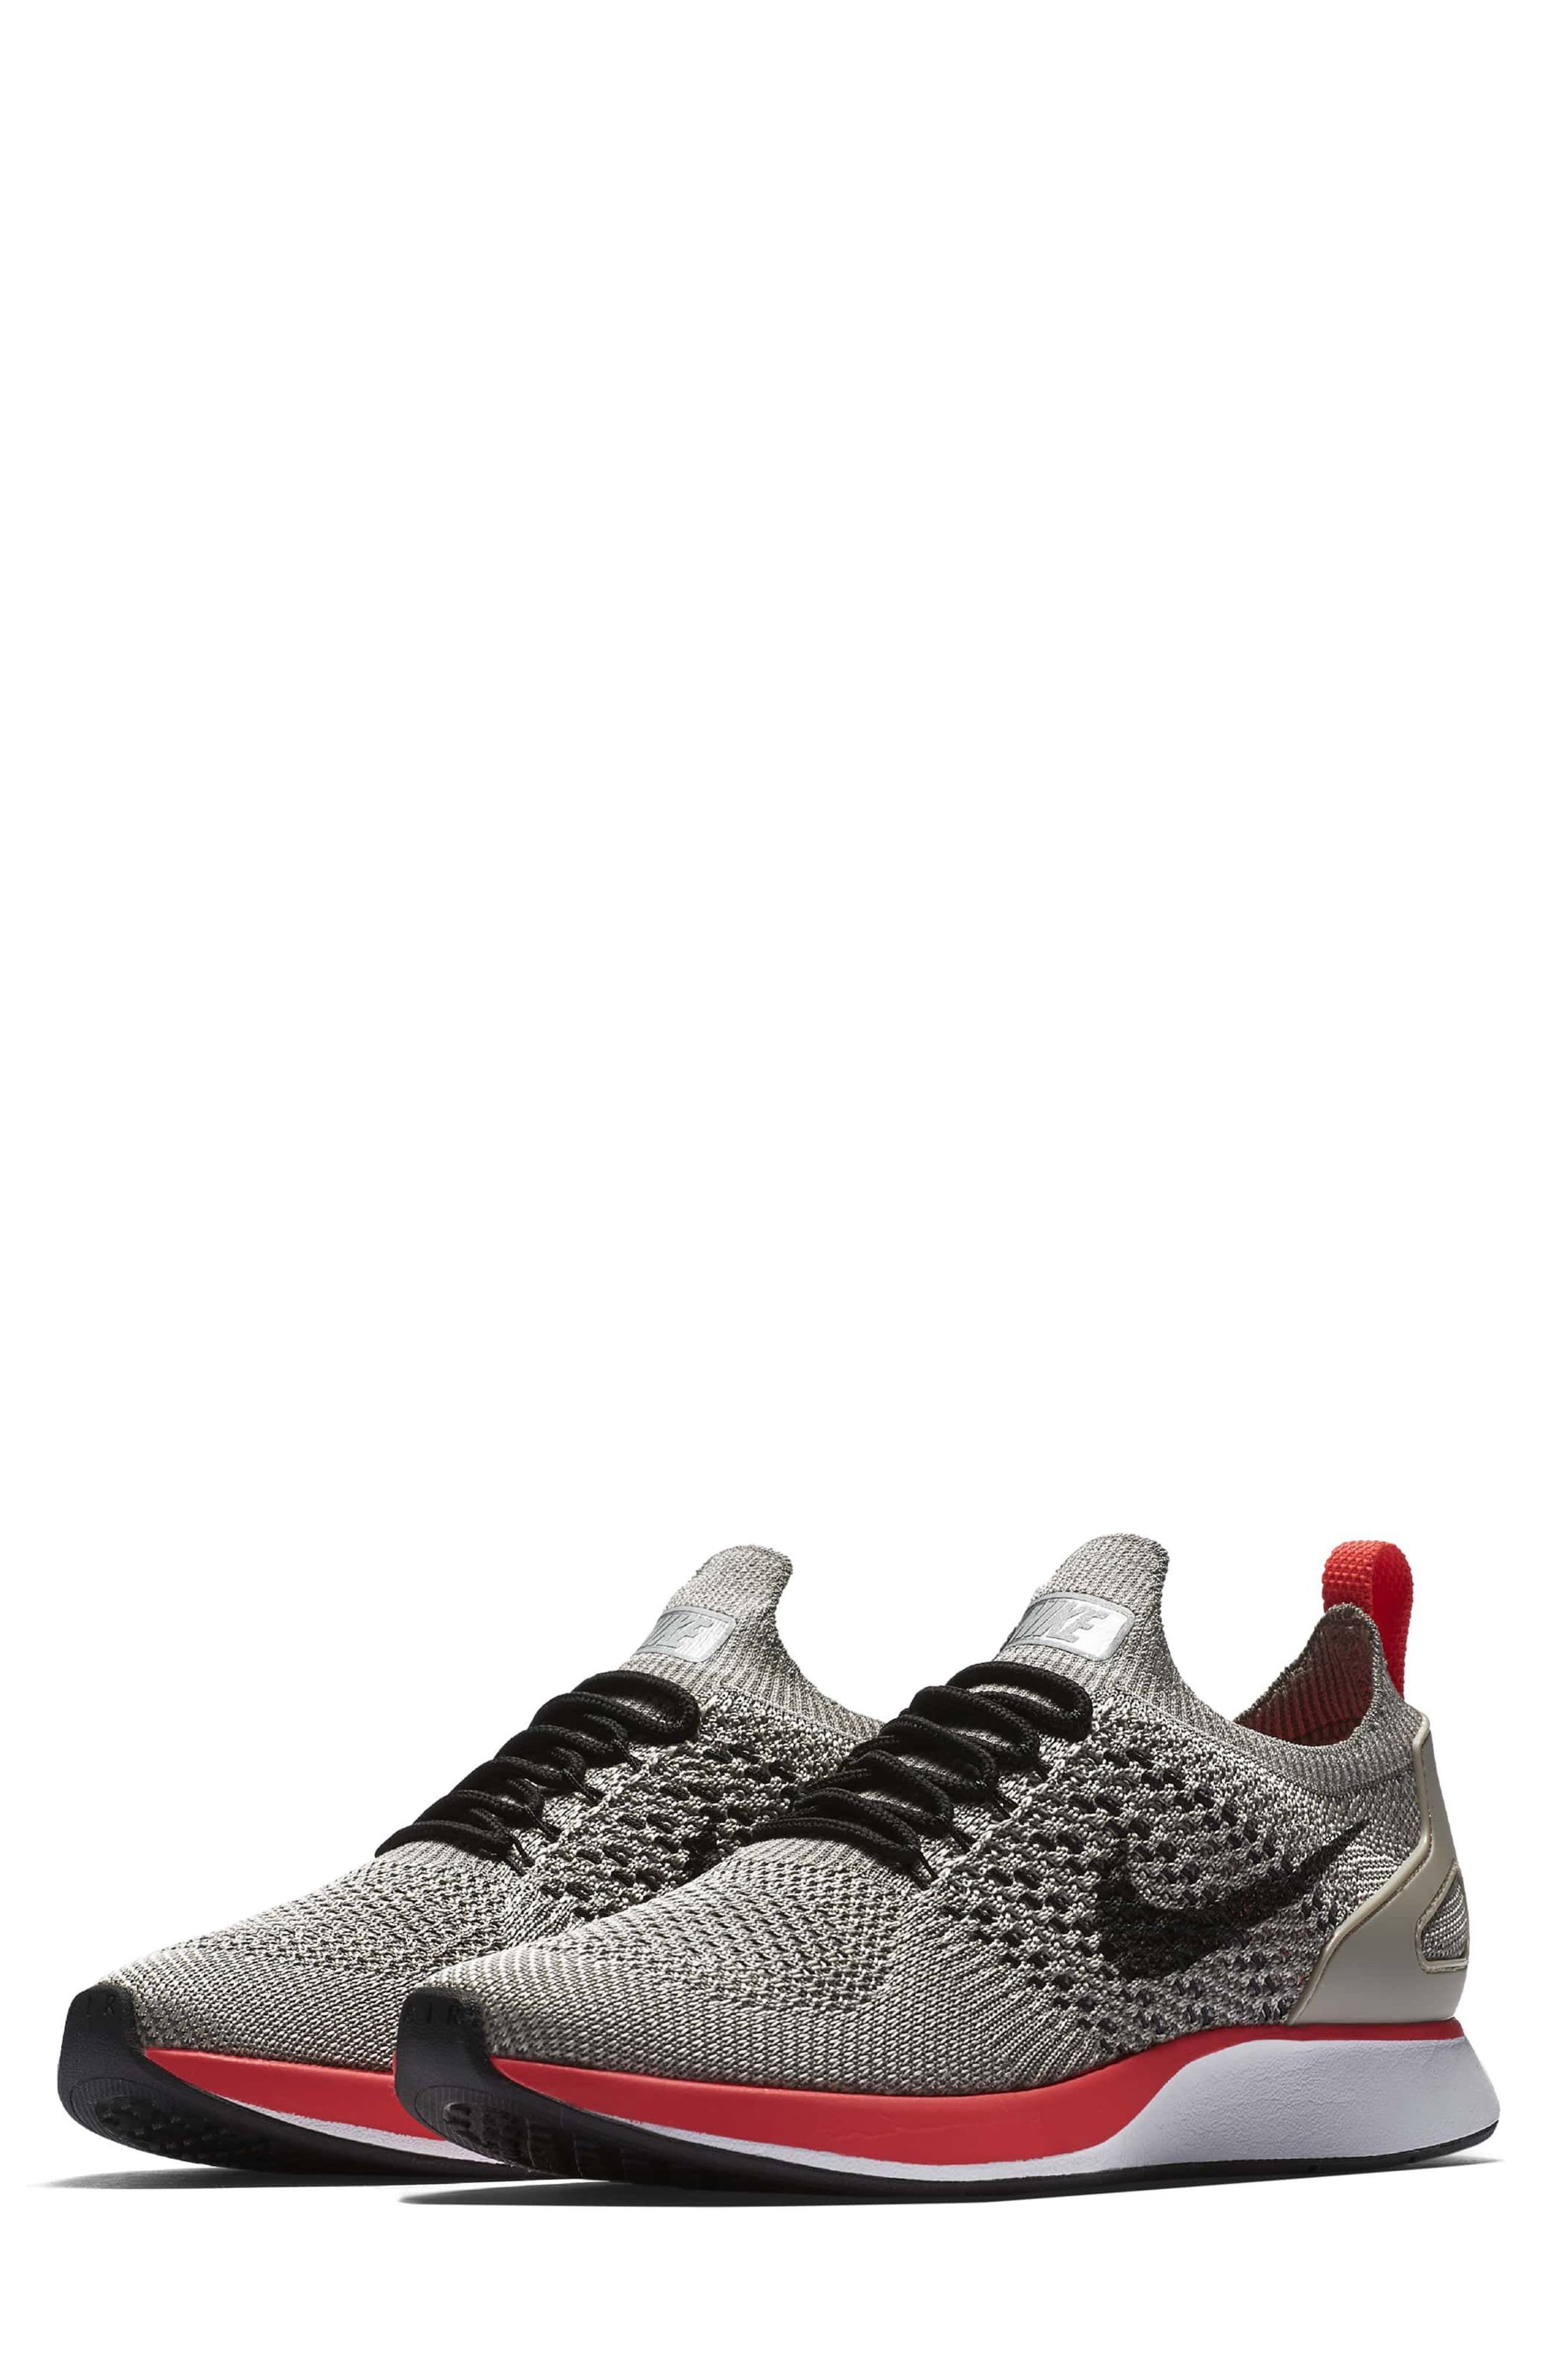 Air Zoom Mariah Flyknit Racer Sneaker,                             Main thumbnail 1, color,                             String/ Black/ White